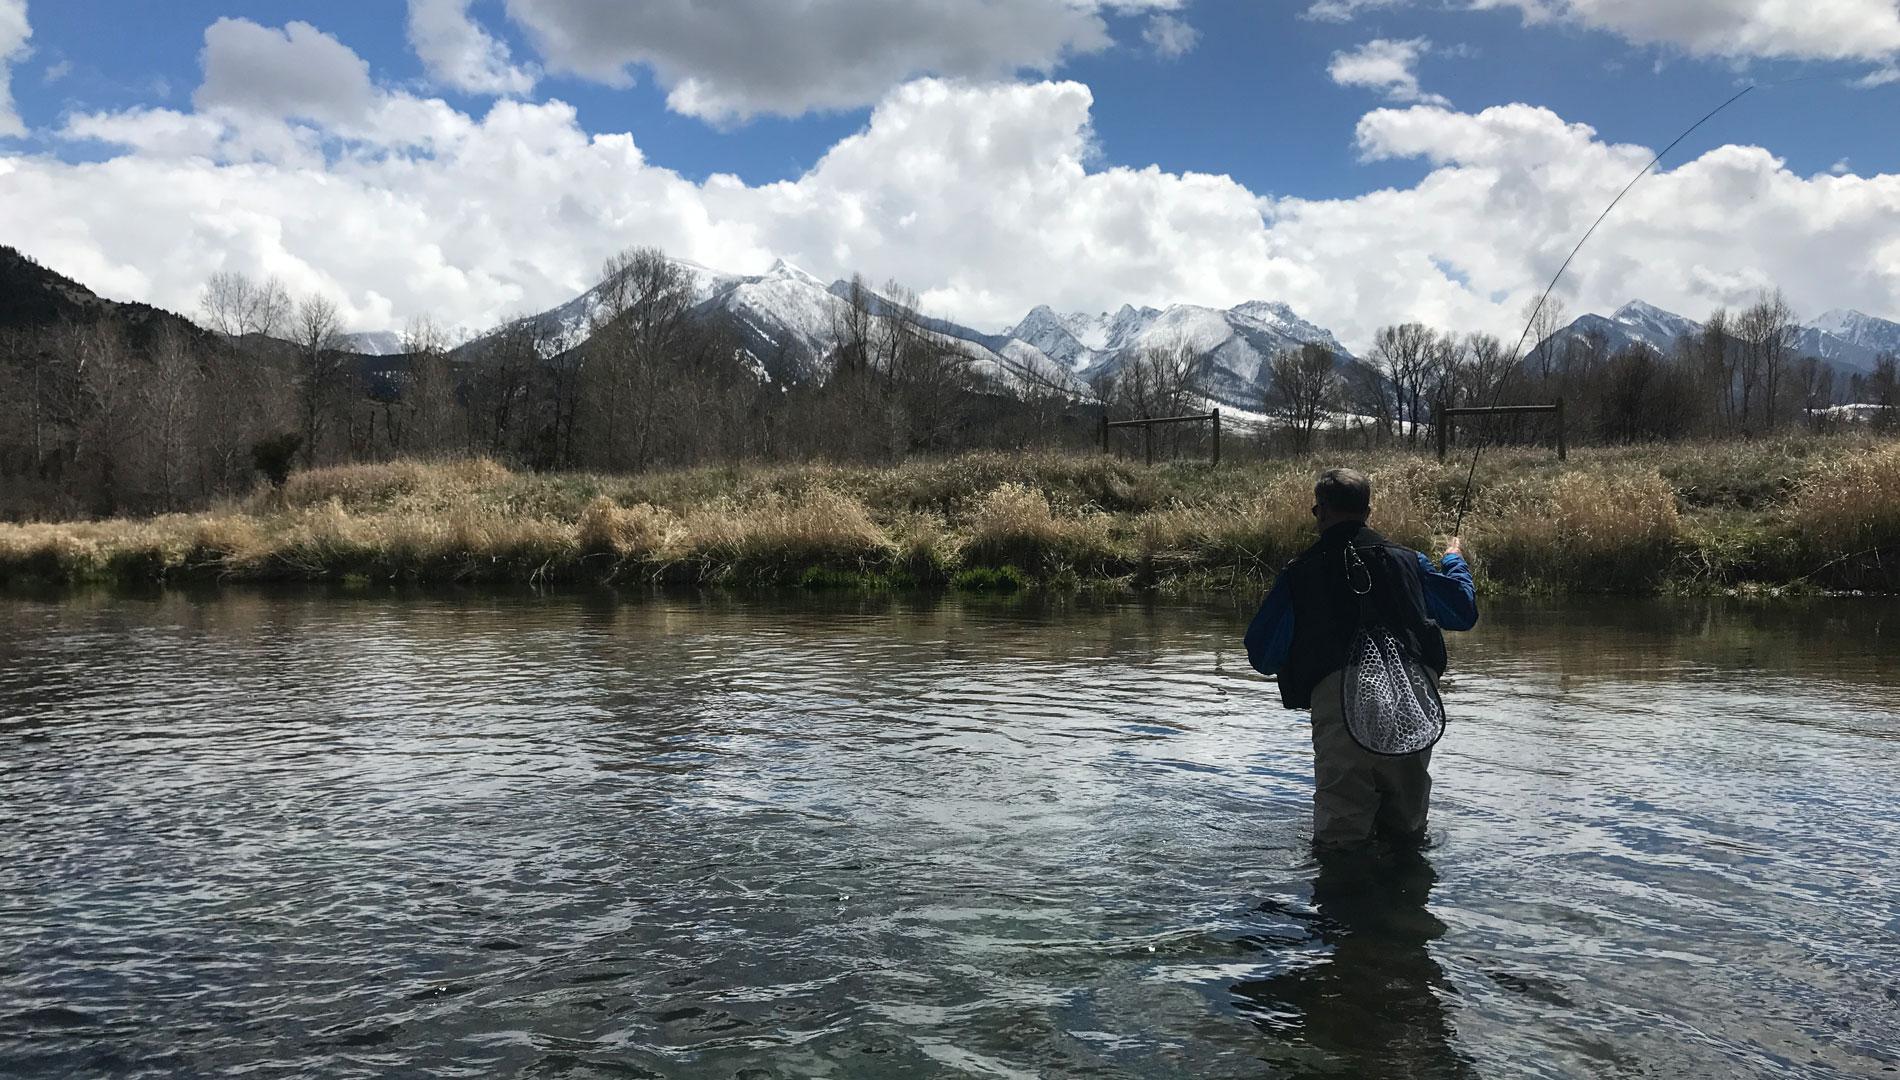 Angler fly fishing in April on DePuy's Spring Creek